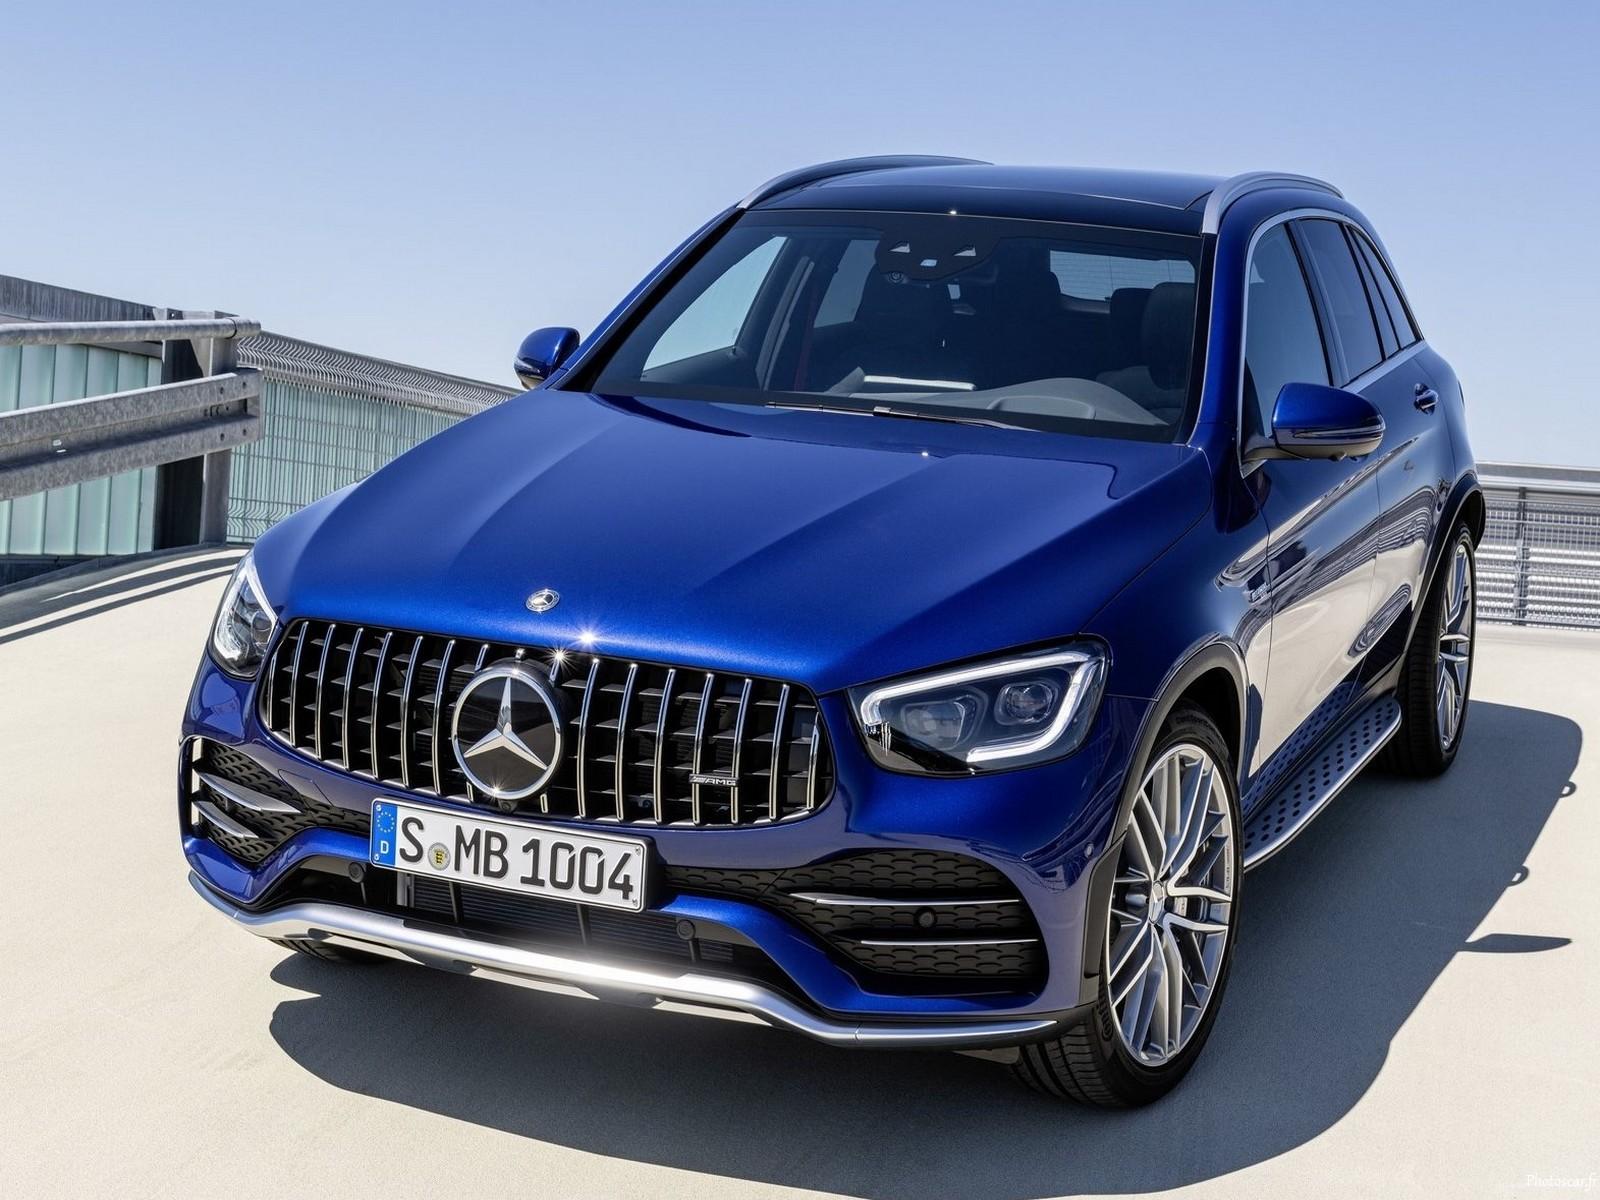 Mercedes-AMG GLC43 4Matic 2020